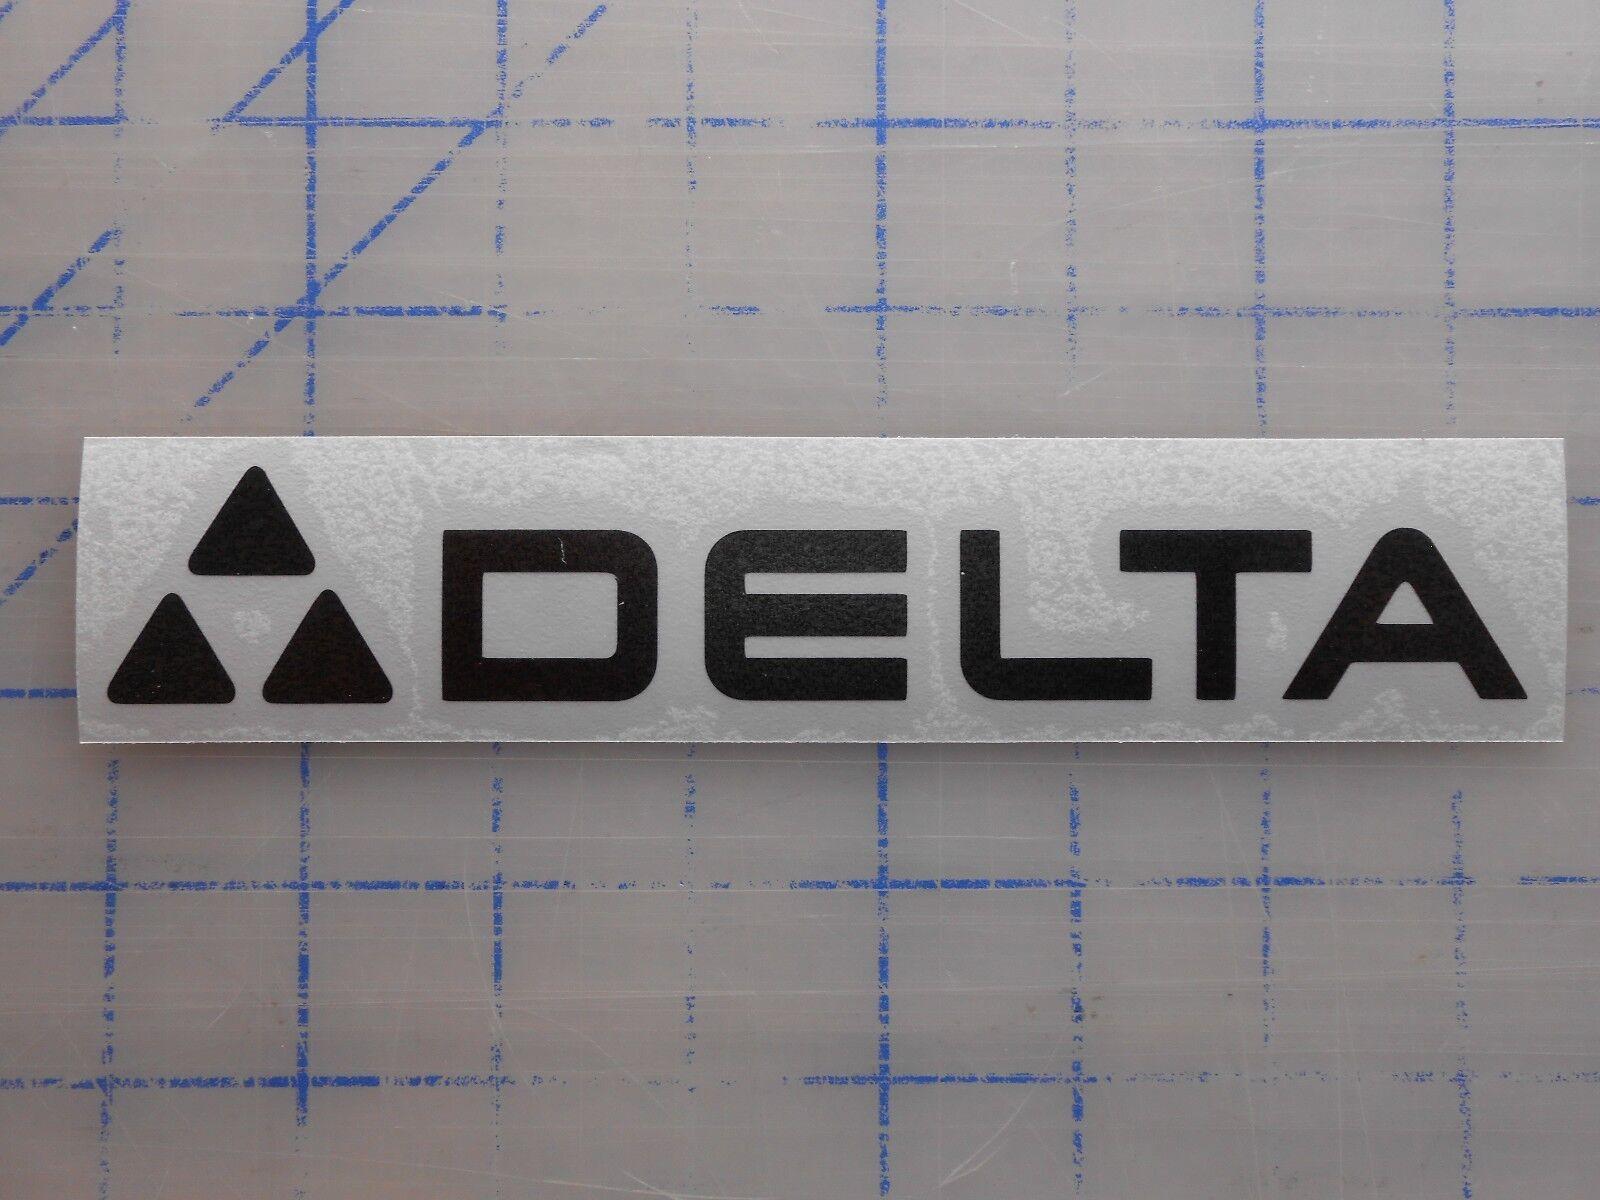 "Delta Decal Sticker 5.5"" 7.5"" 11"" Chop Saw Miter Drill Press"